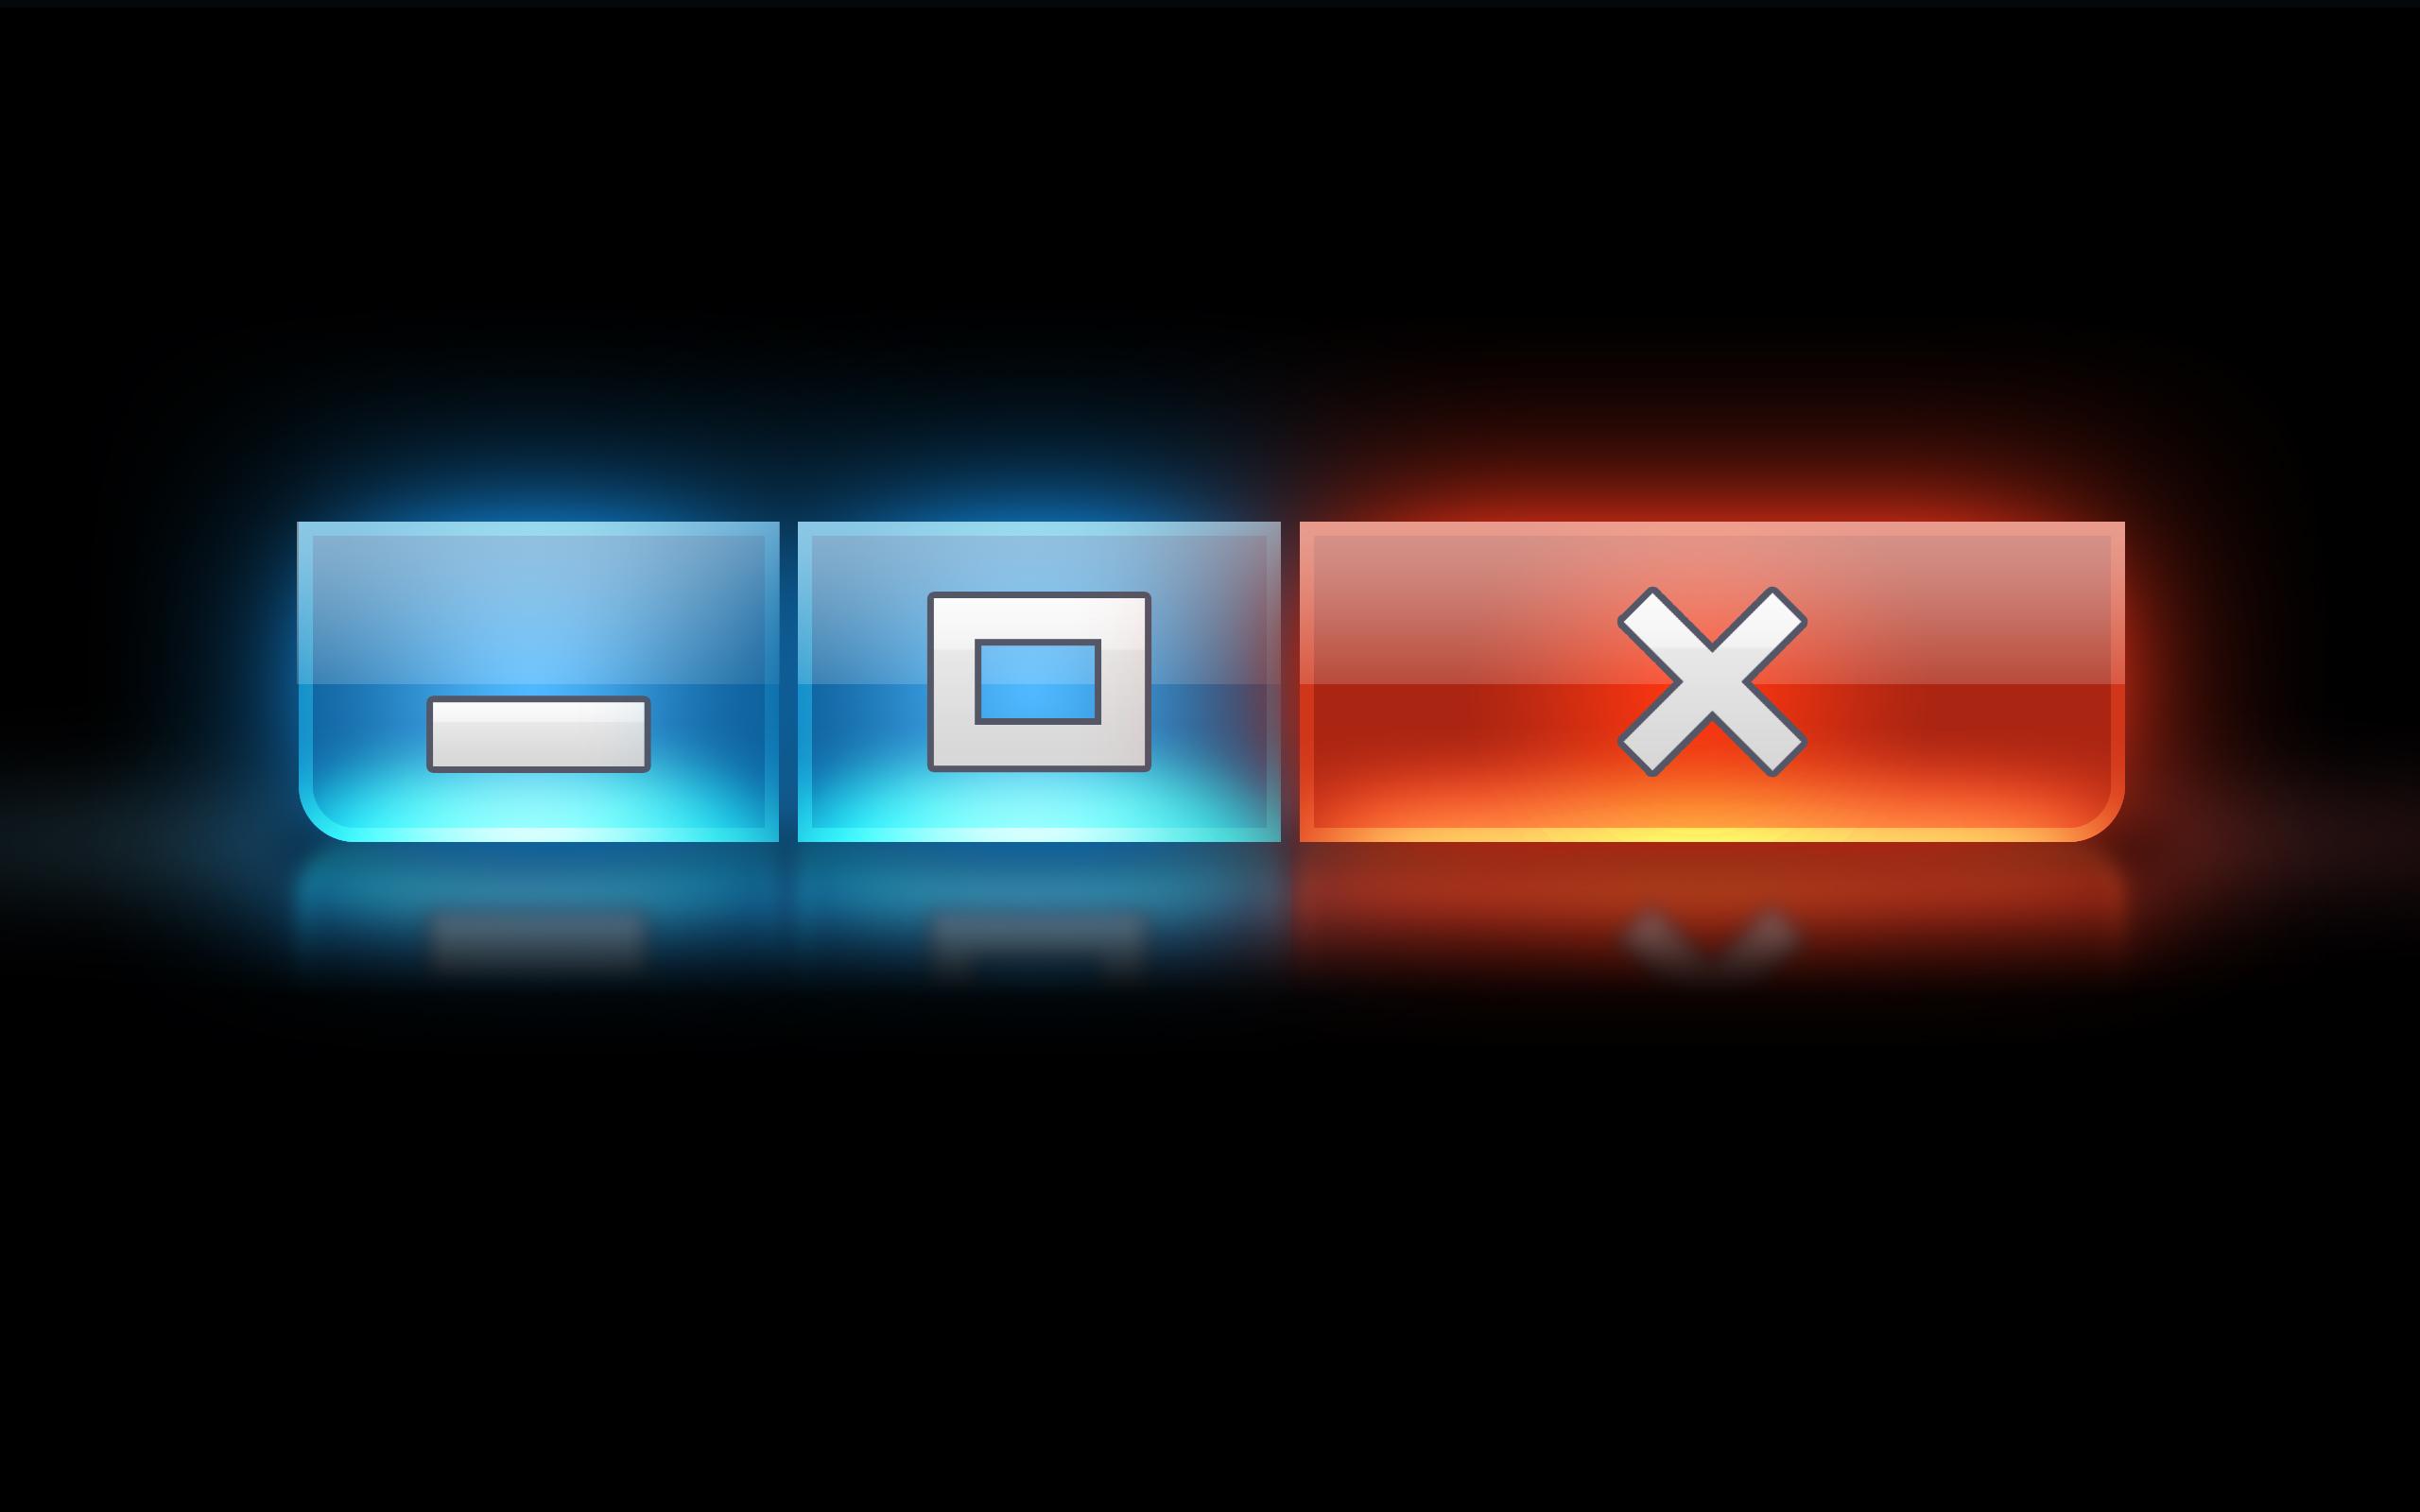 11 Minimize Maximize Icons Win 8 Images